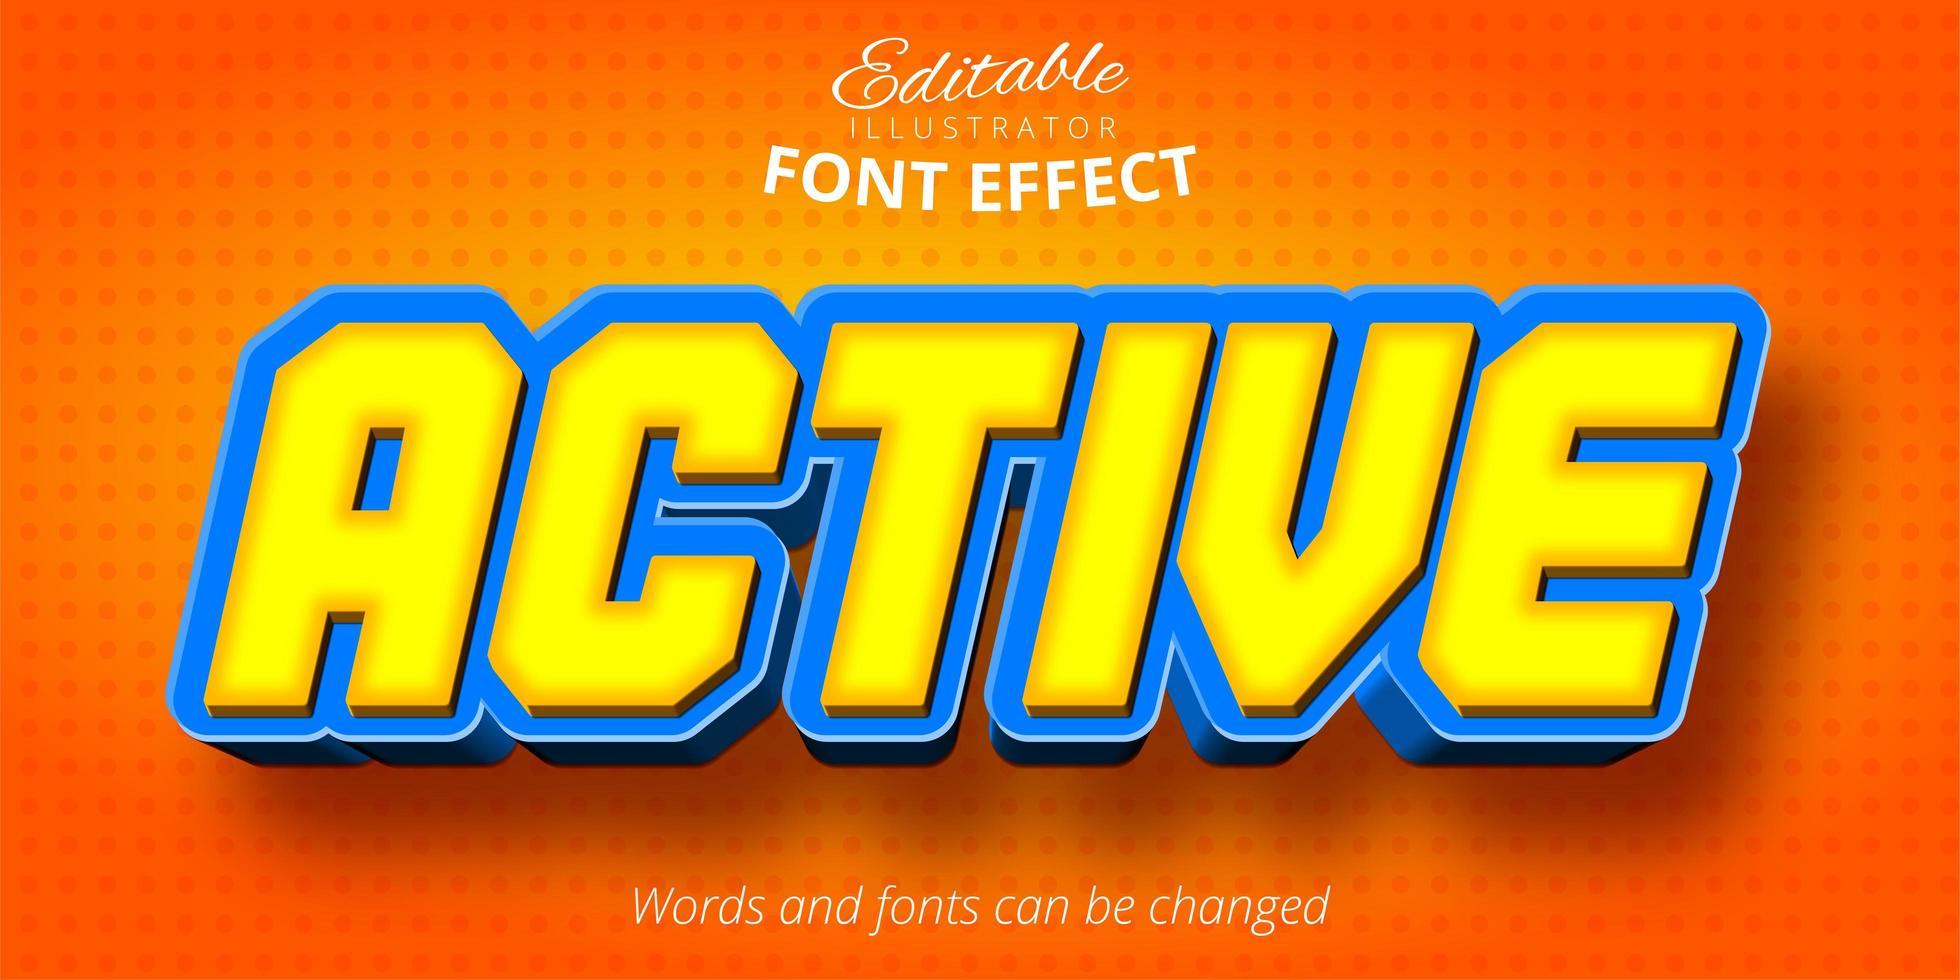 aktiv redigerbar texteffekt vektor